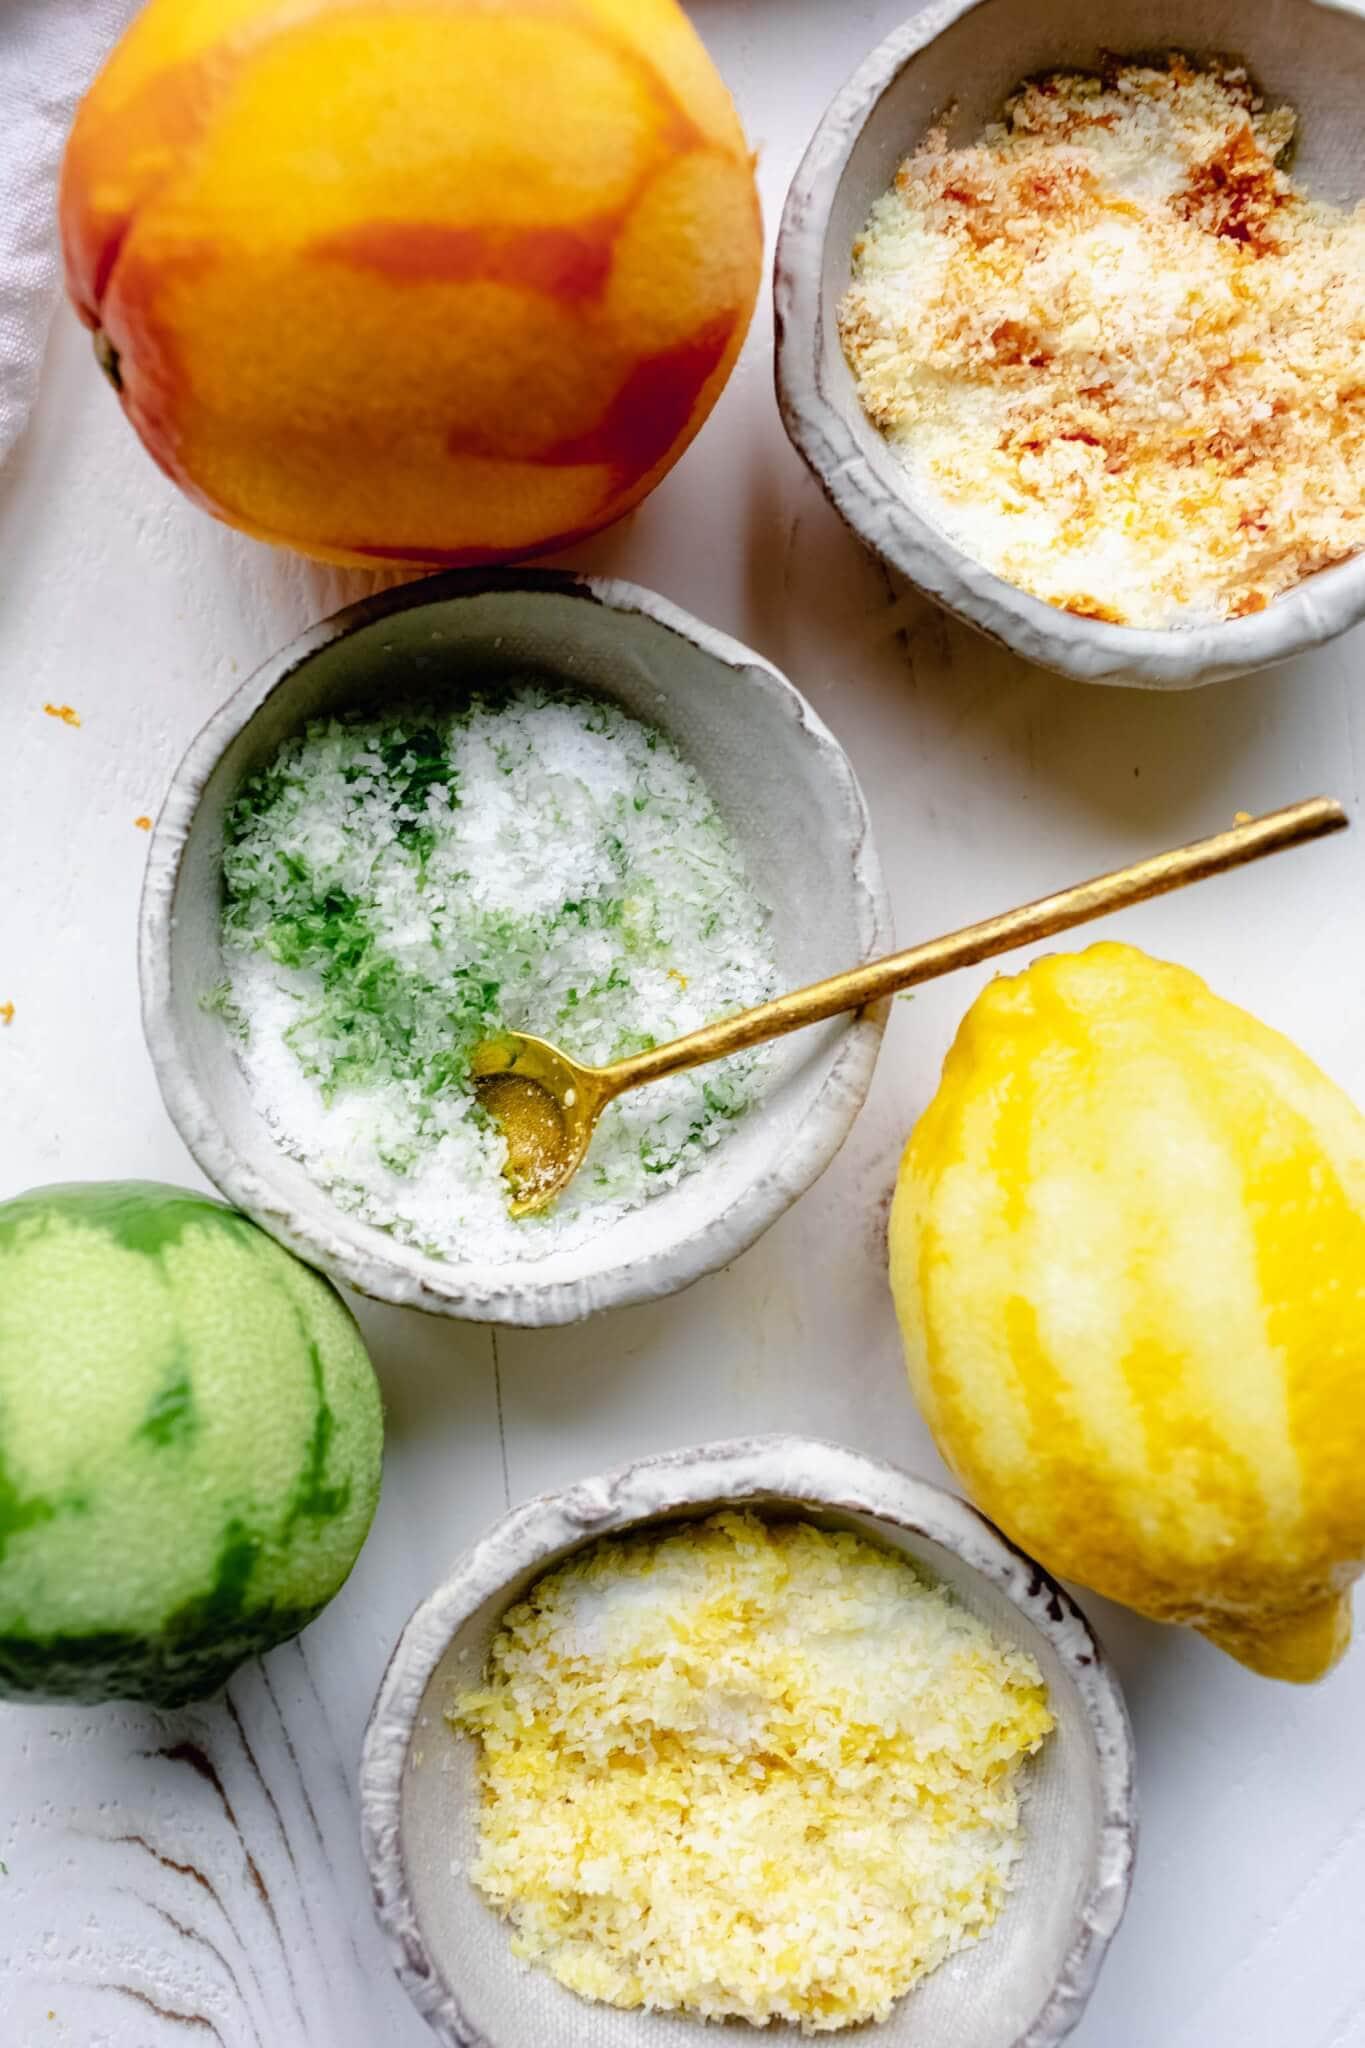 Overhead shot of three types of citrus salt - orange, lime and lemon